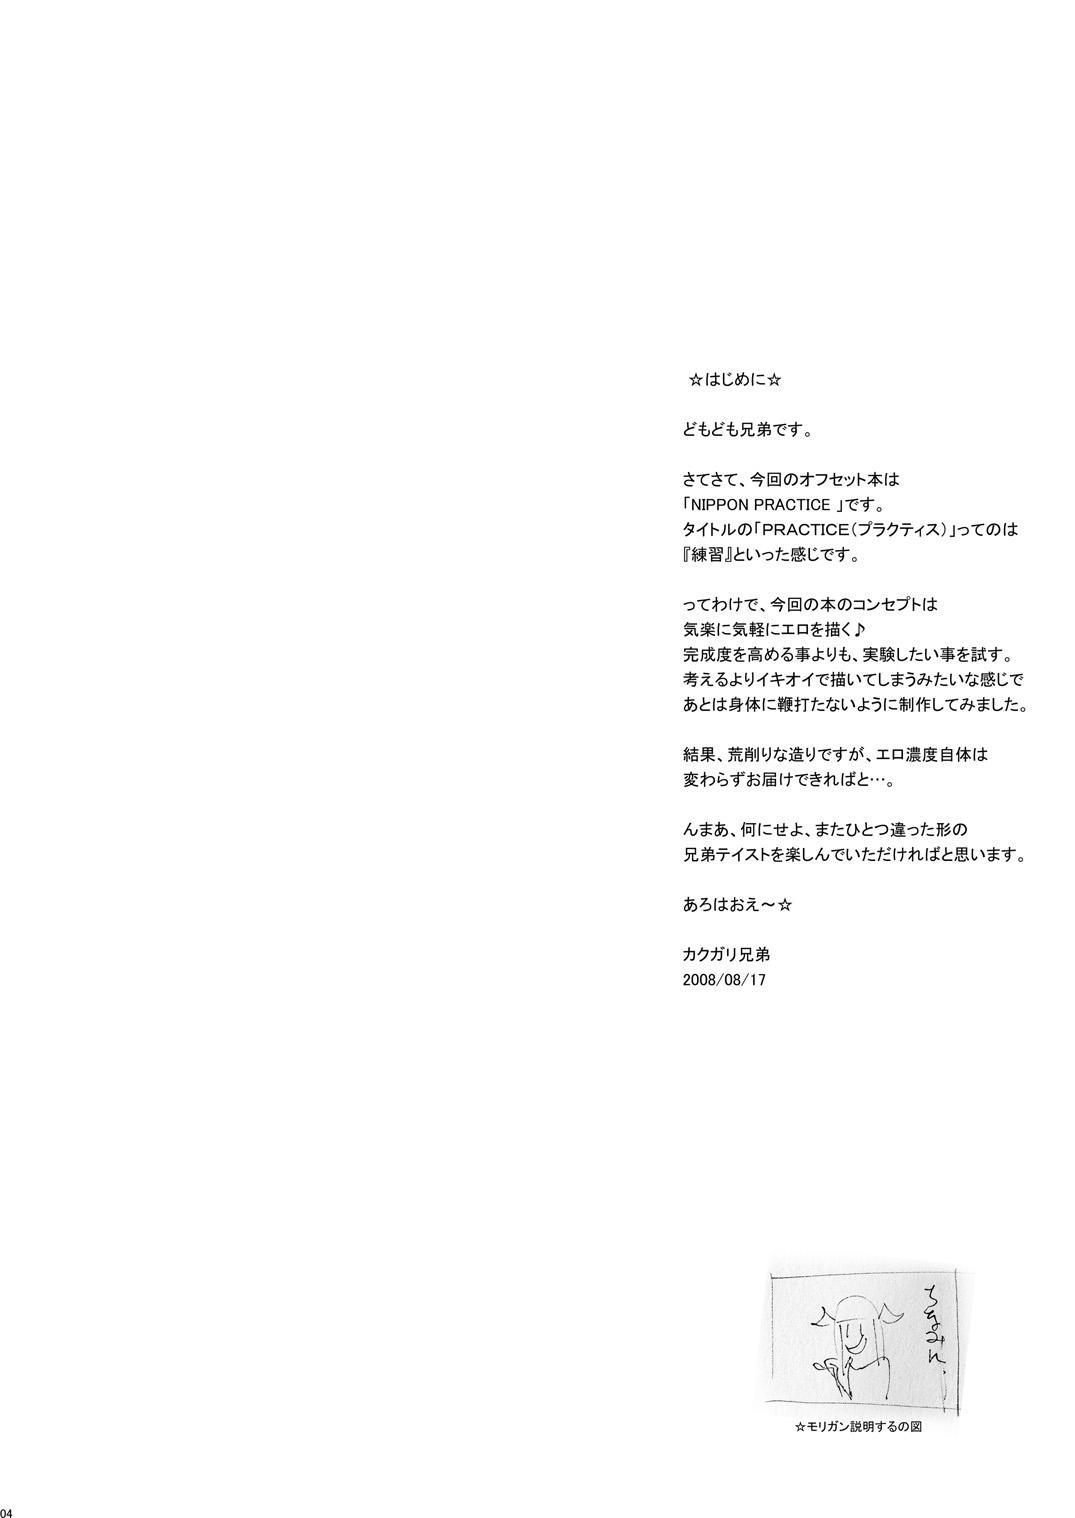 NIPPON PRACTICE 1 DLver. 2